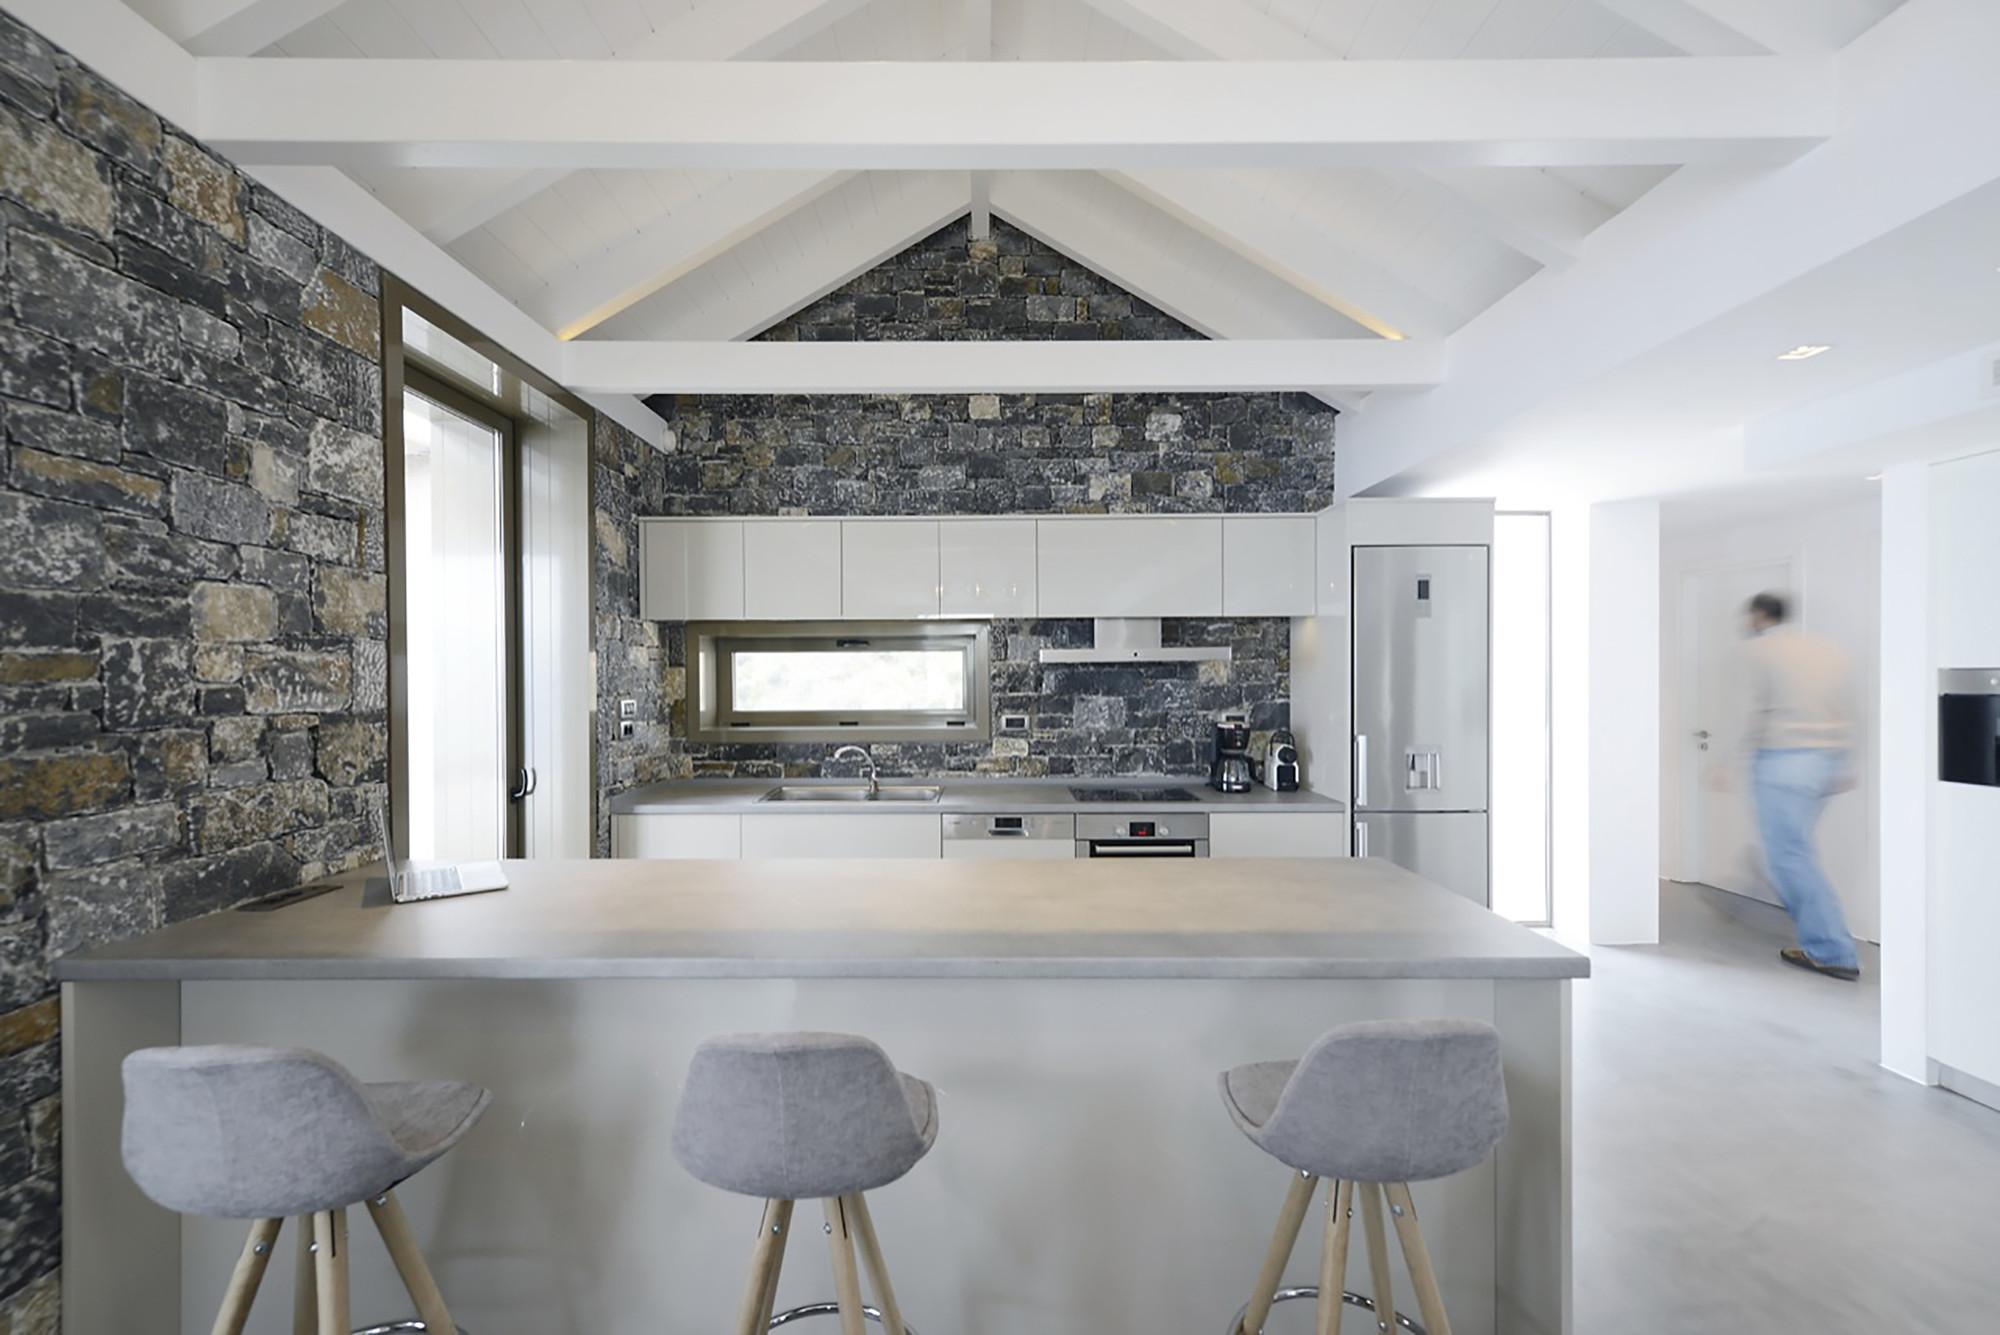 Gallery of villa melana valia foufa panagiotis for Greek kitchen designs